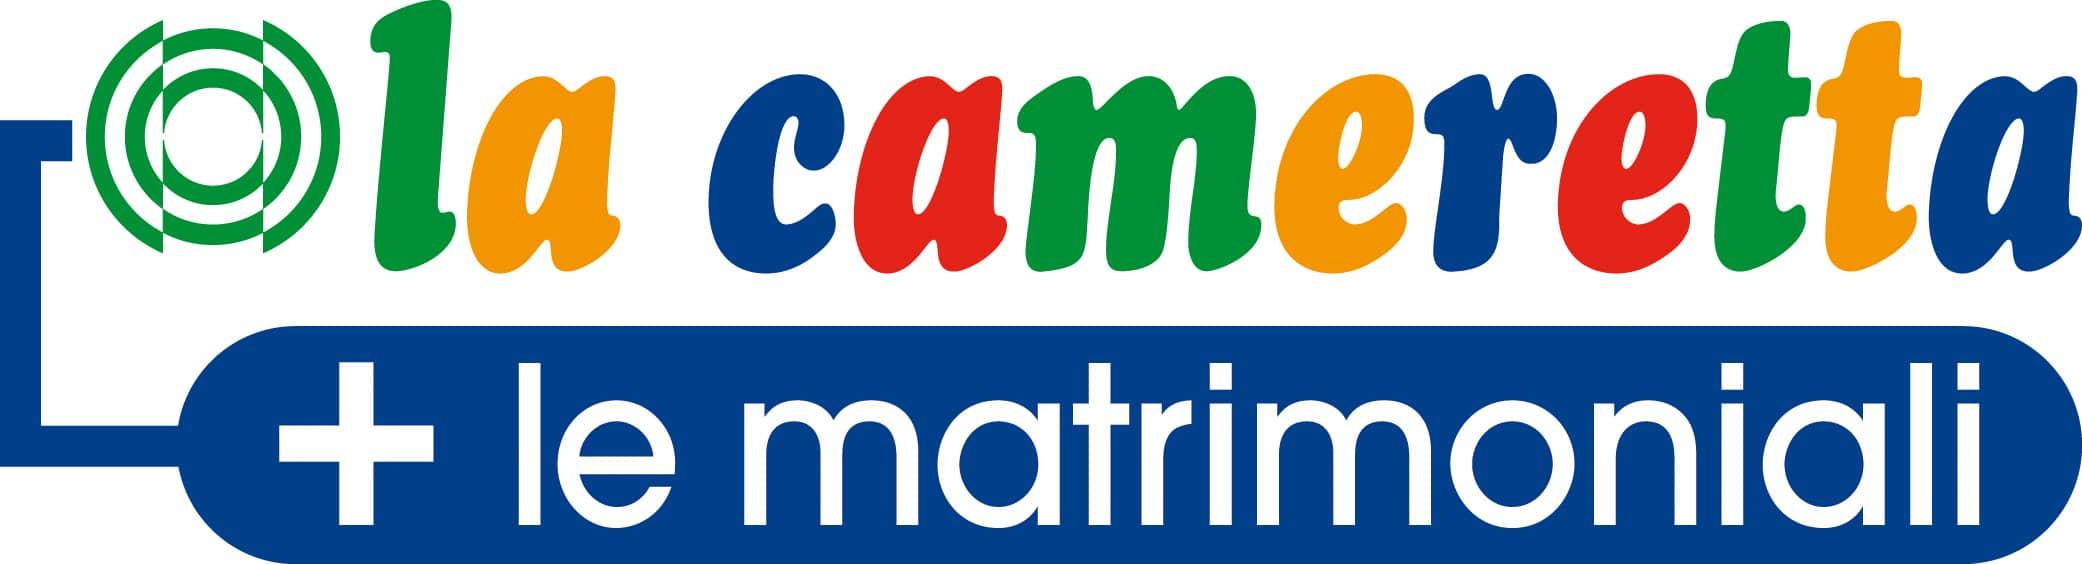 LaCameretta